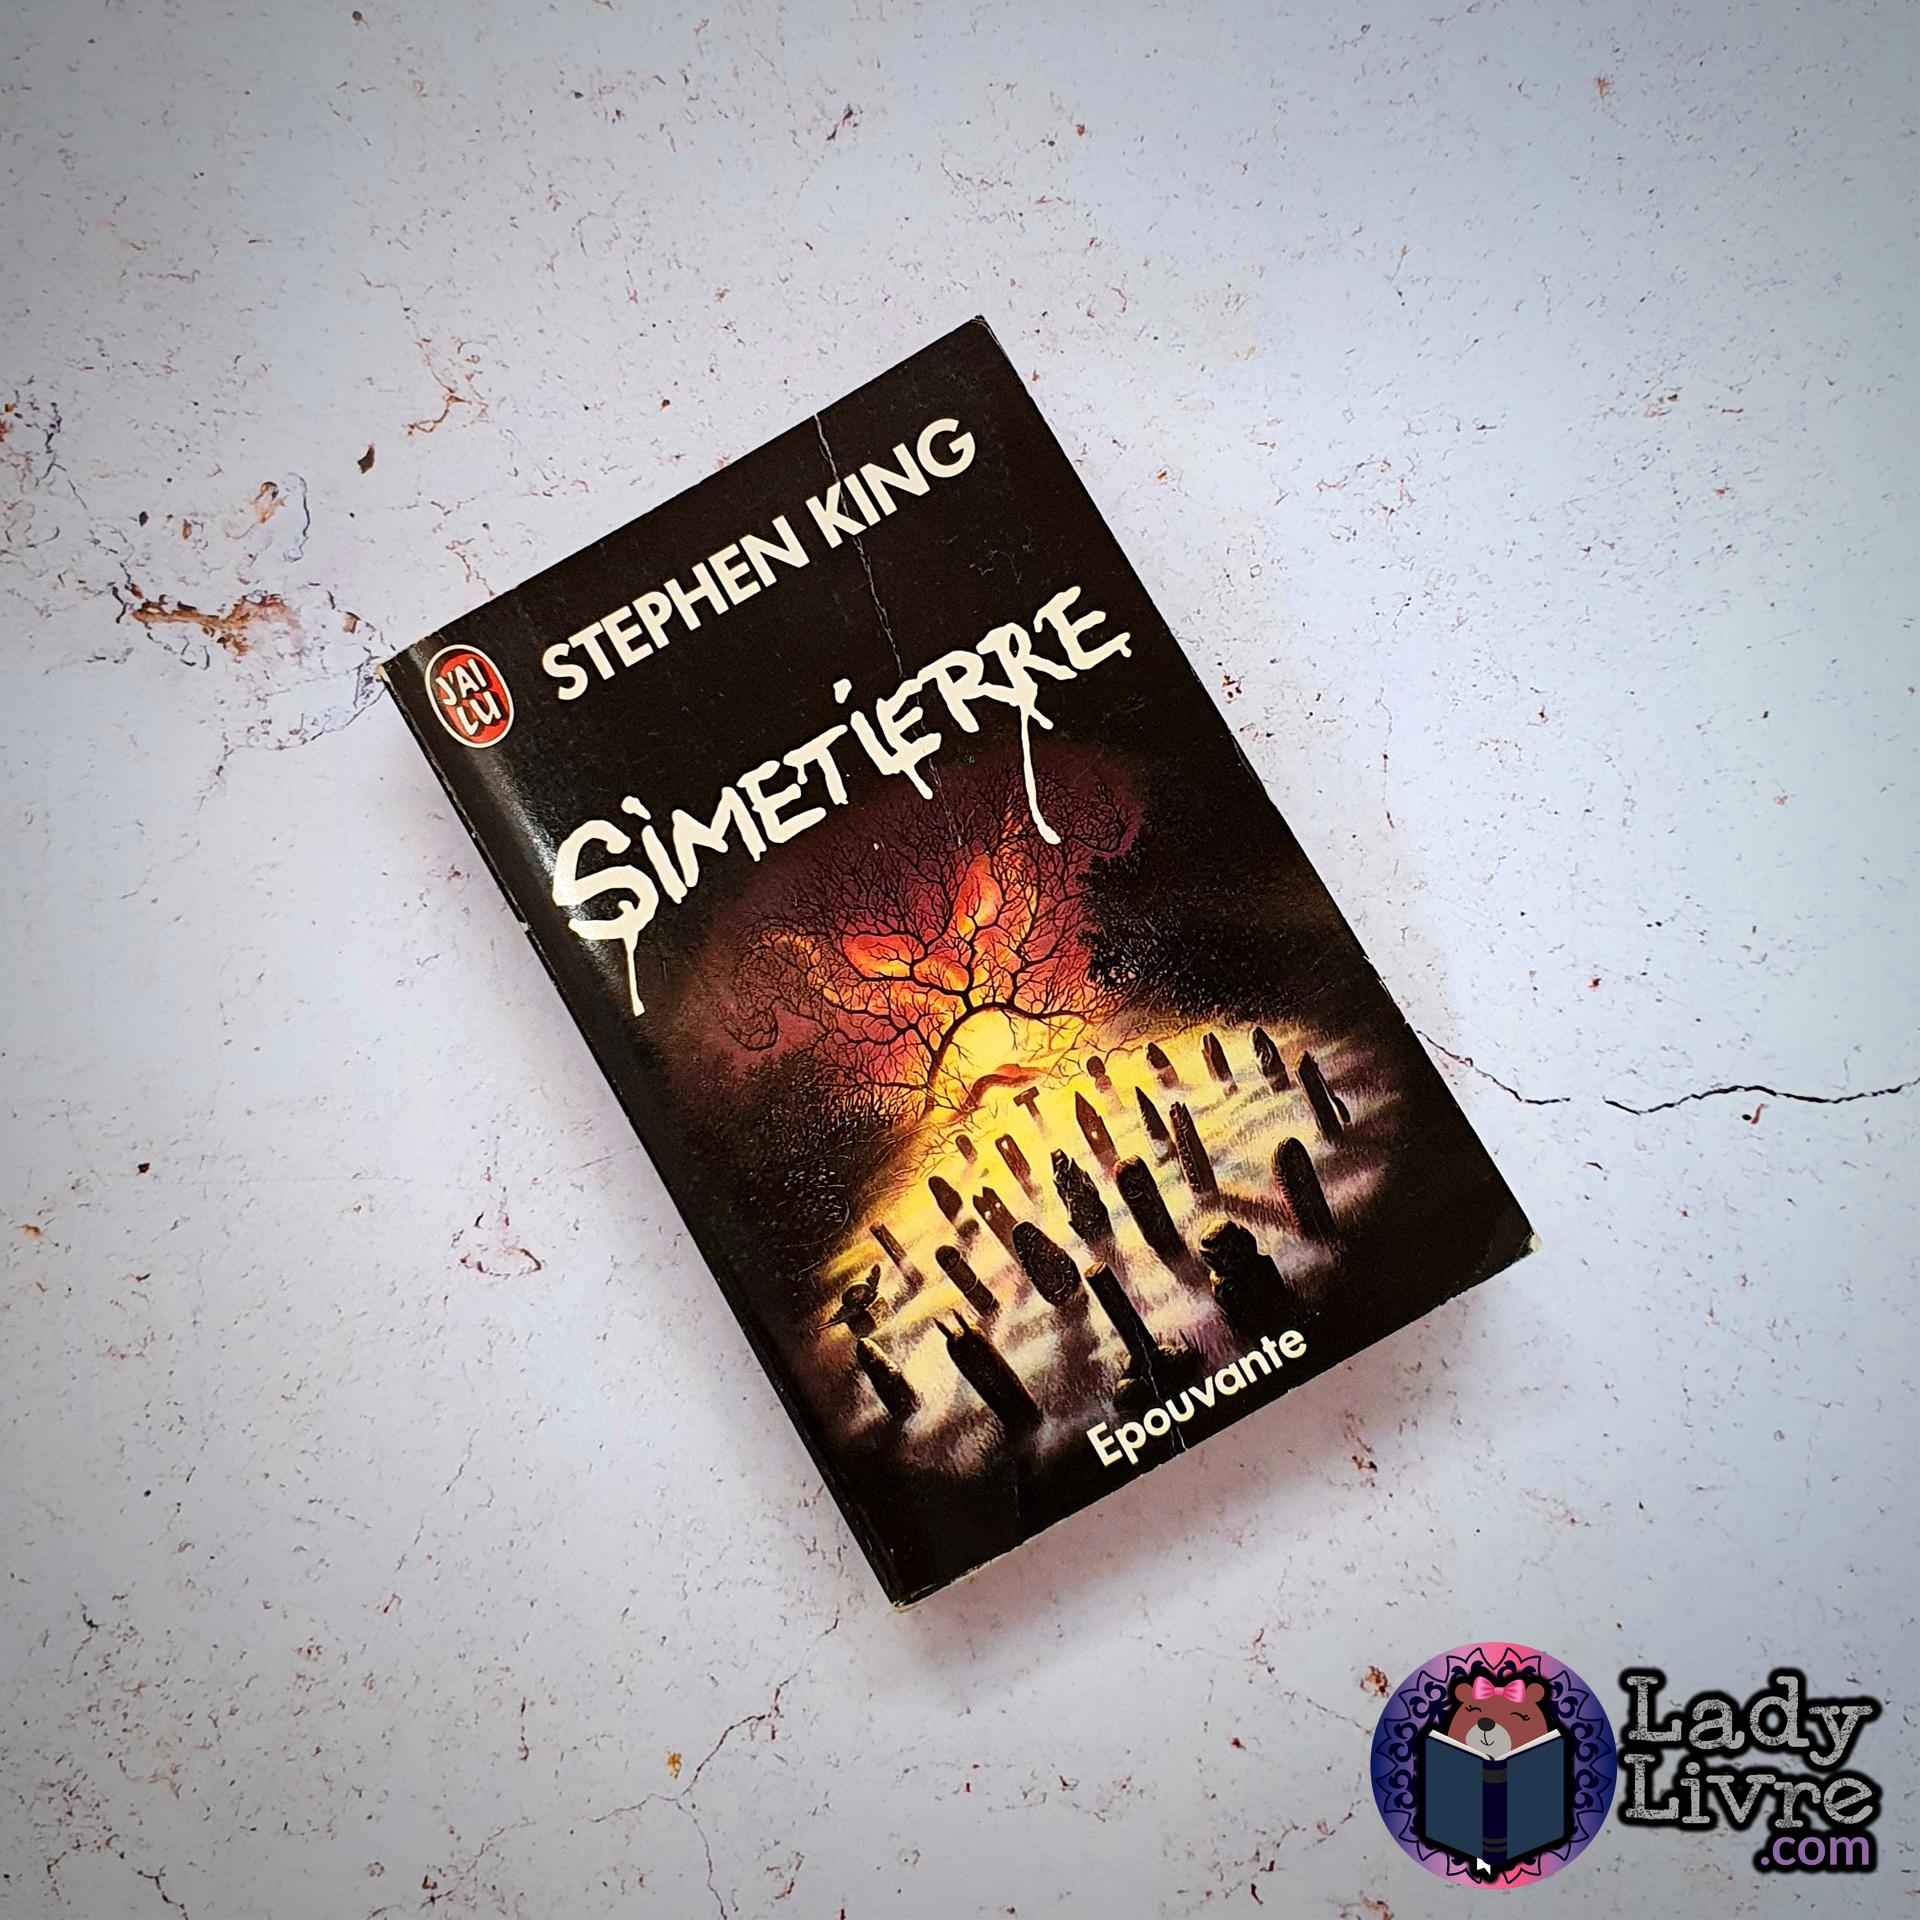 Simetierre - Stephen King